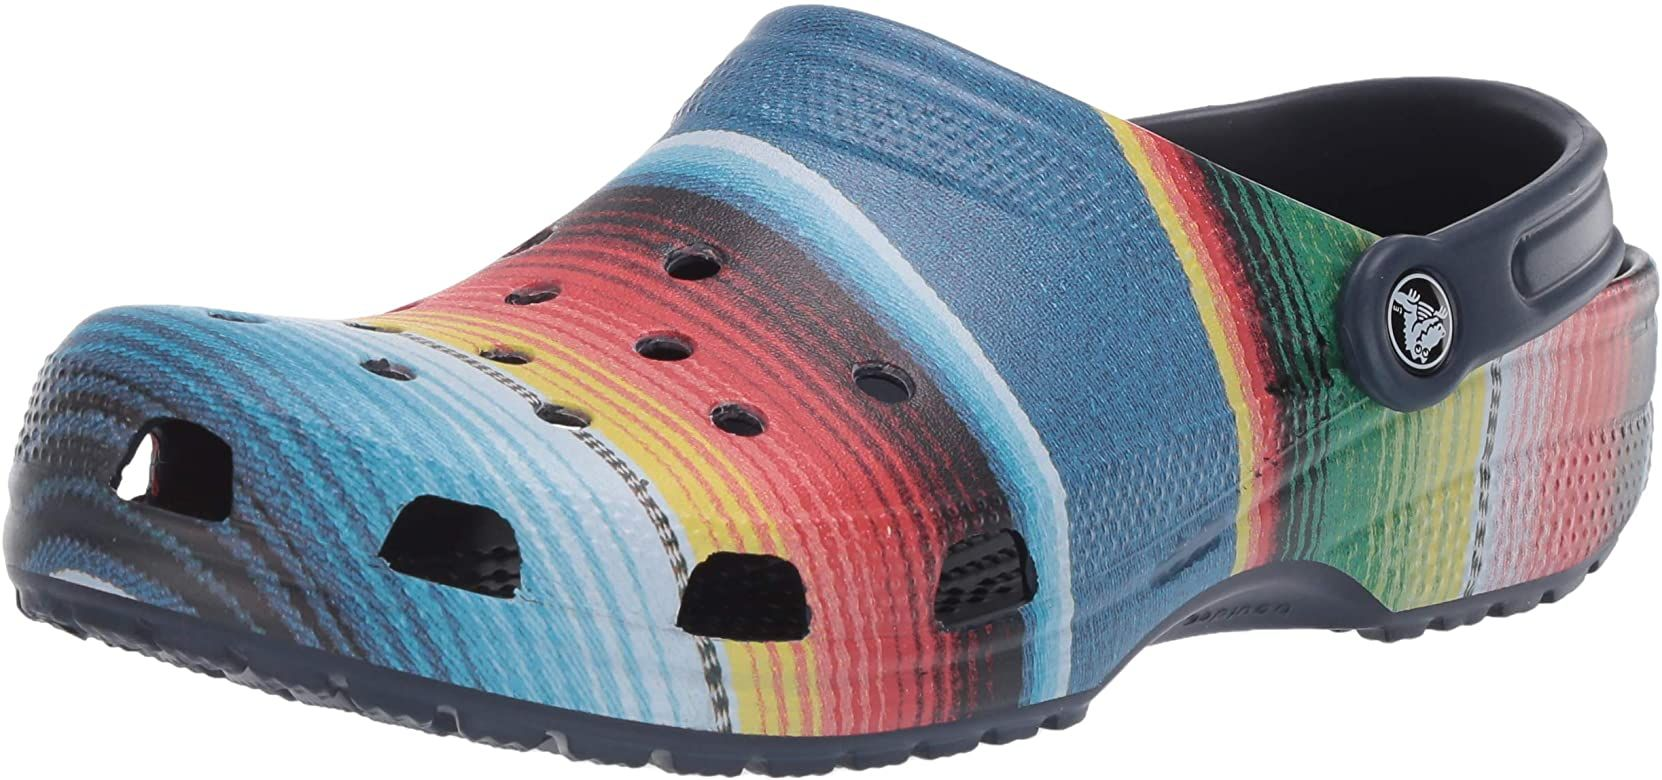 Comfortable Slip on Casual Water Shoe Navy 8 M US Women // 6 M US Men Crocs Womens Classic Clog